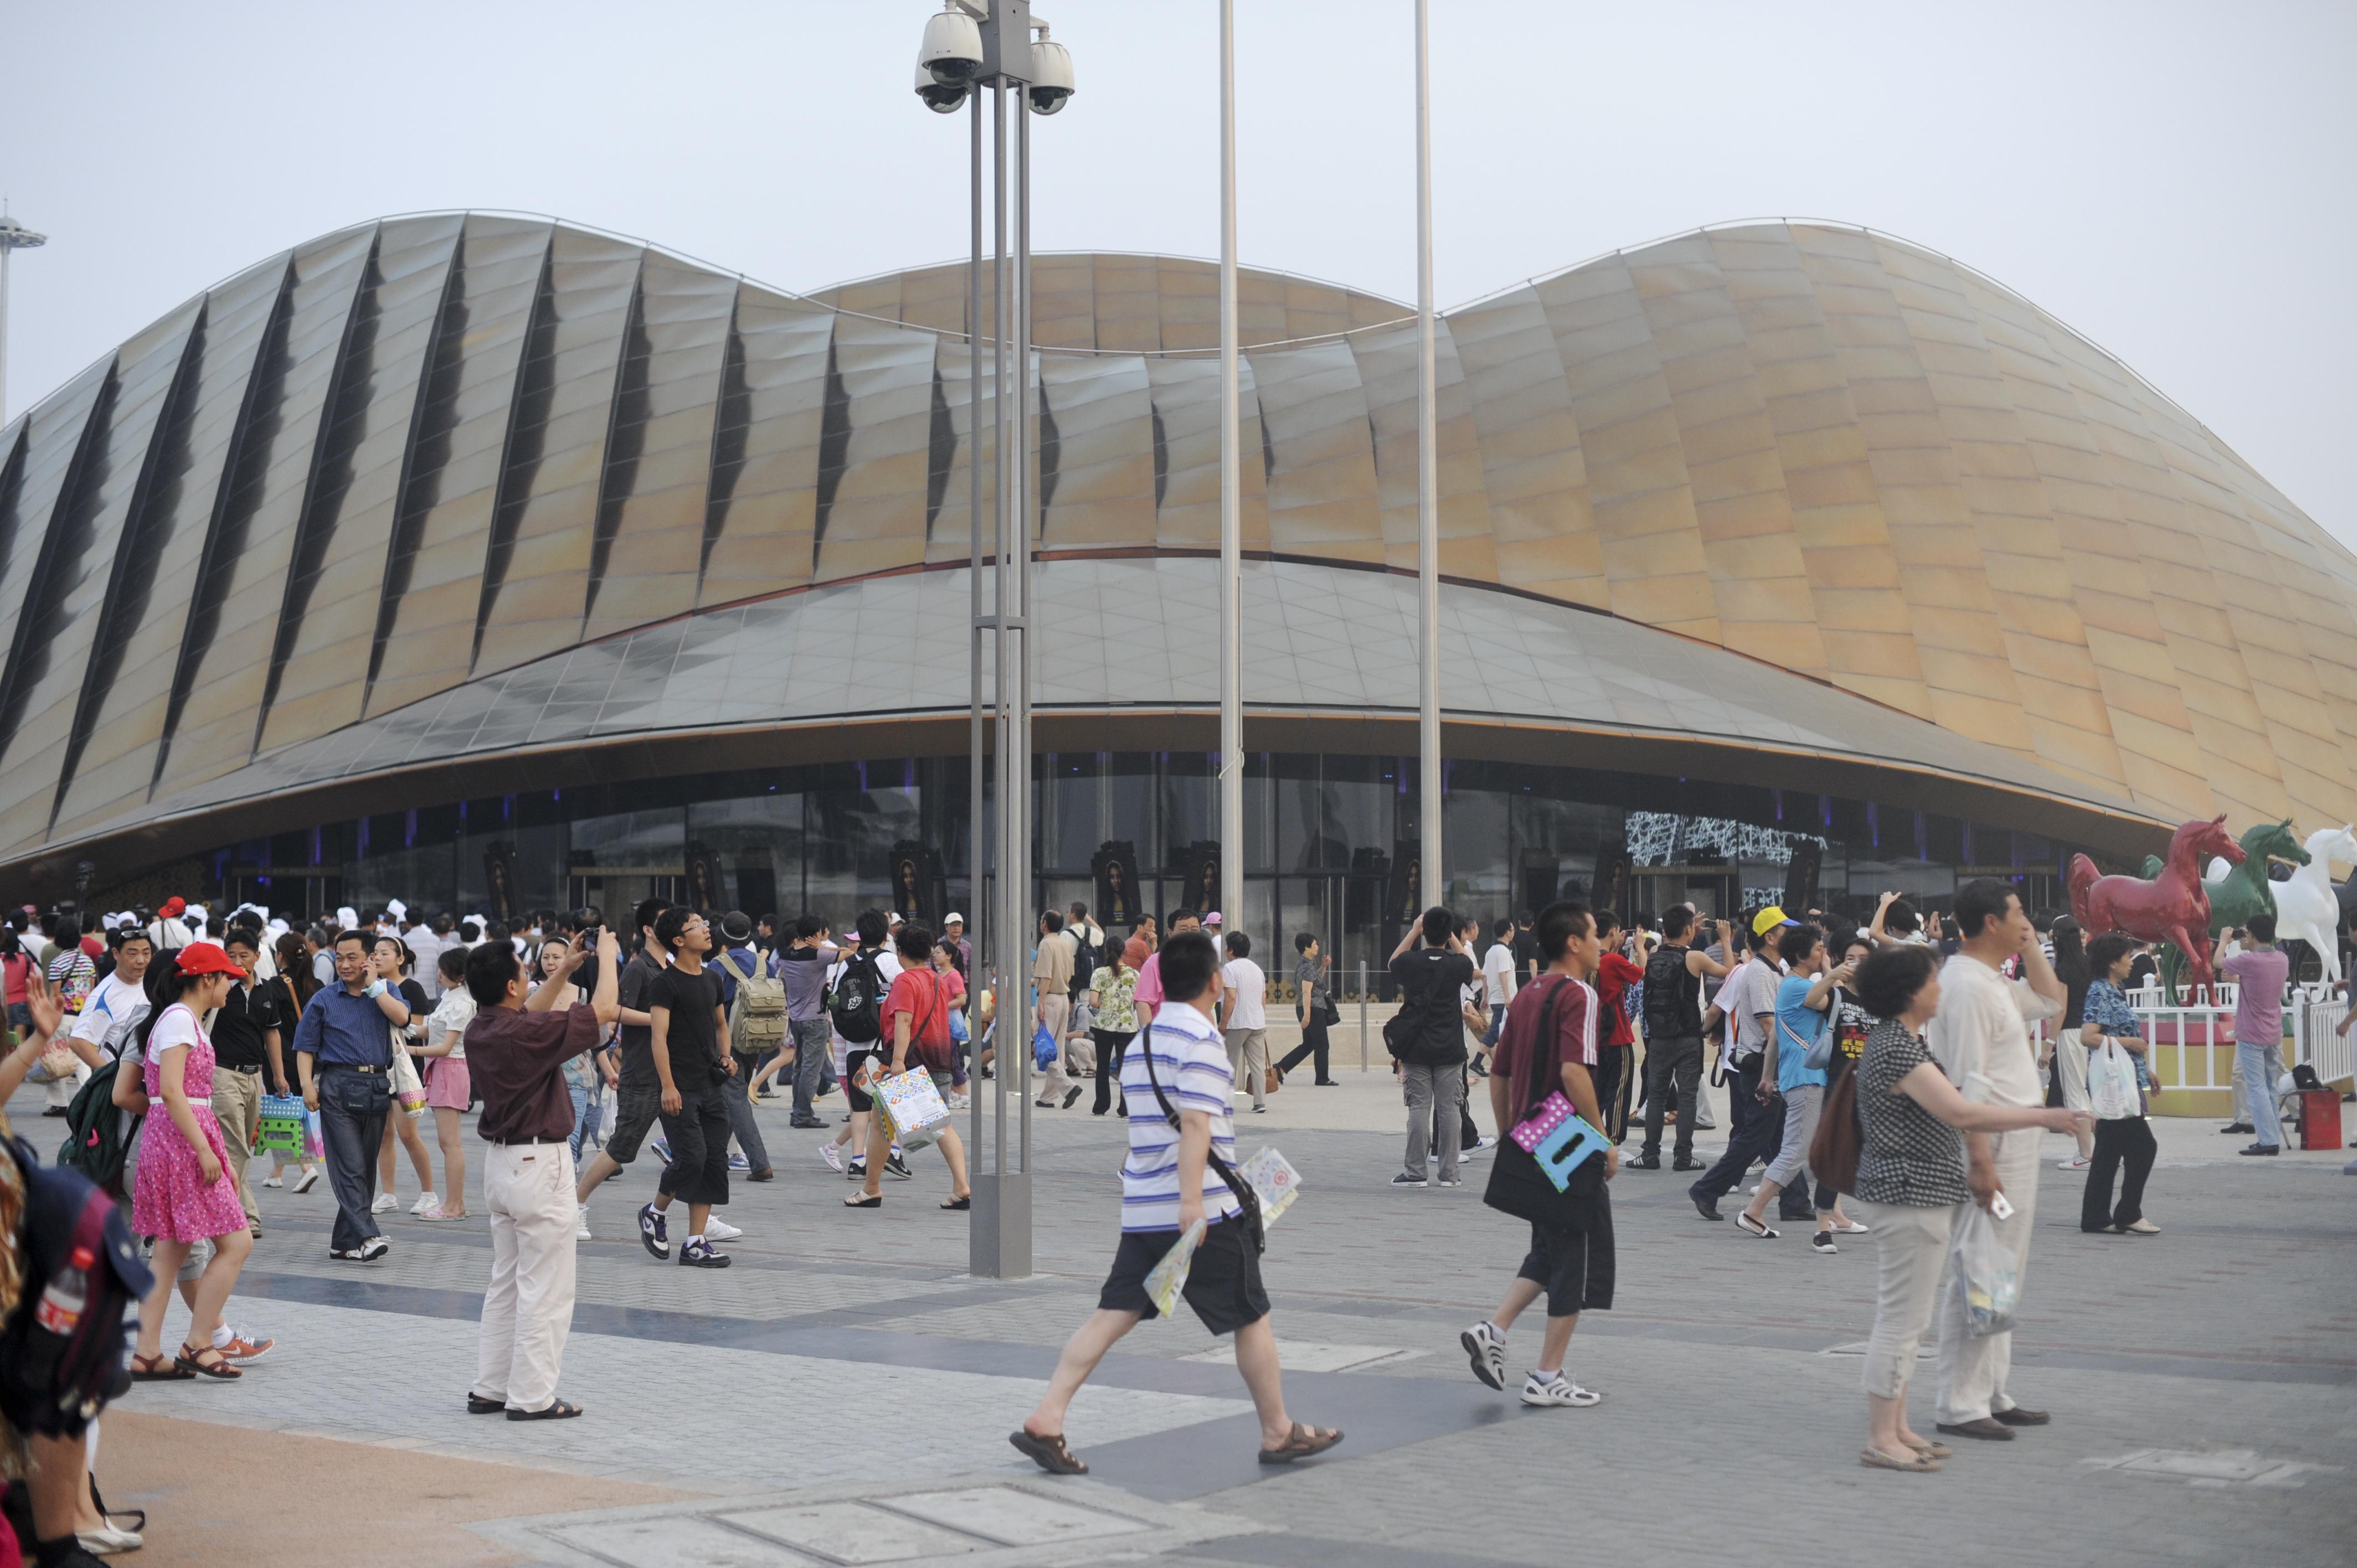 Expo 2010 shanghai china uae pavilion larry speck for Expo 2010 pavilions